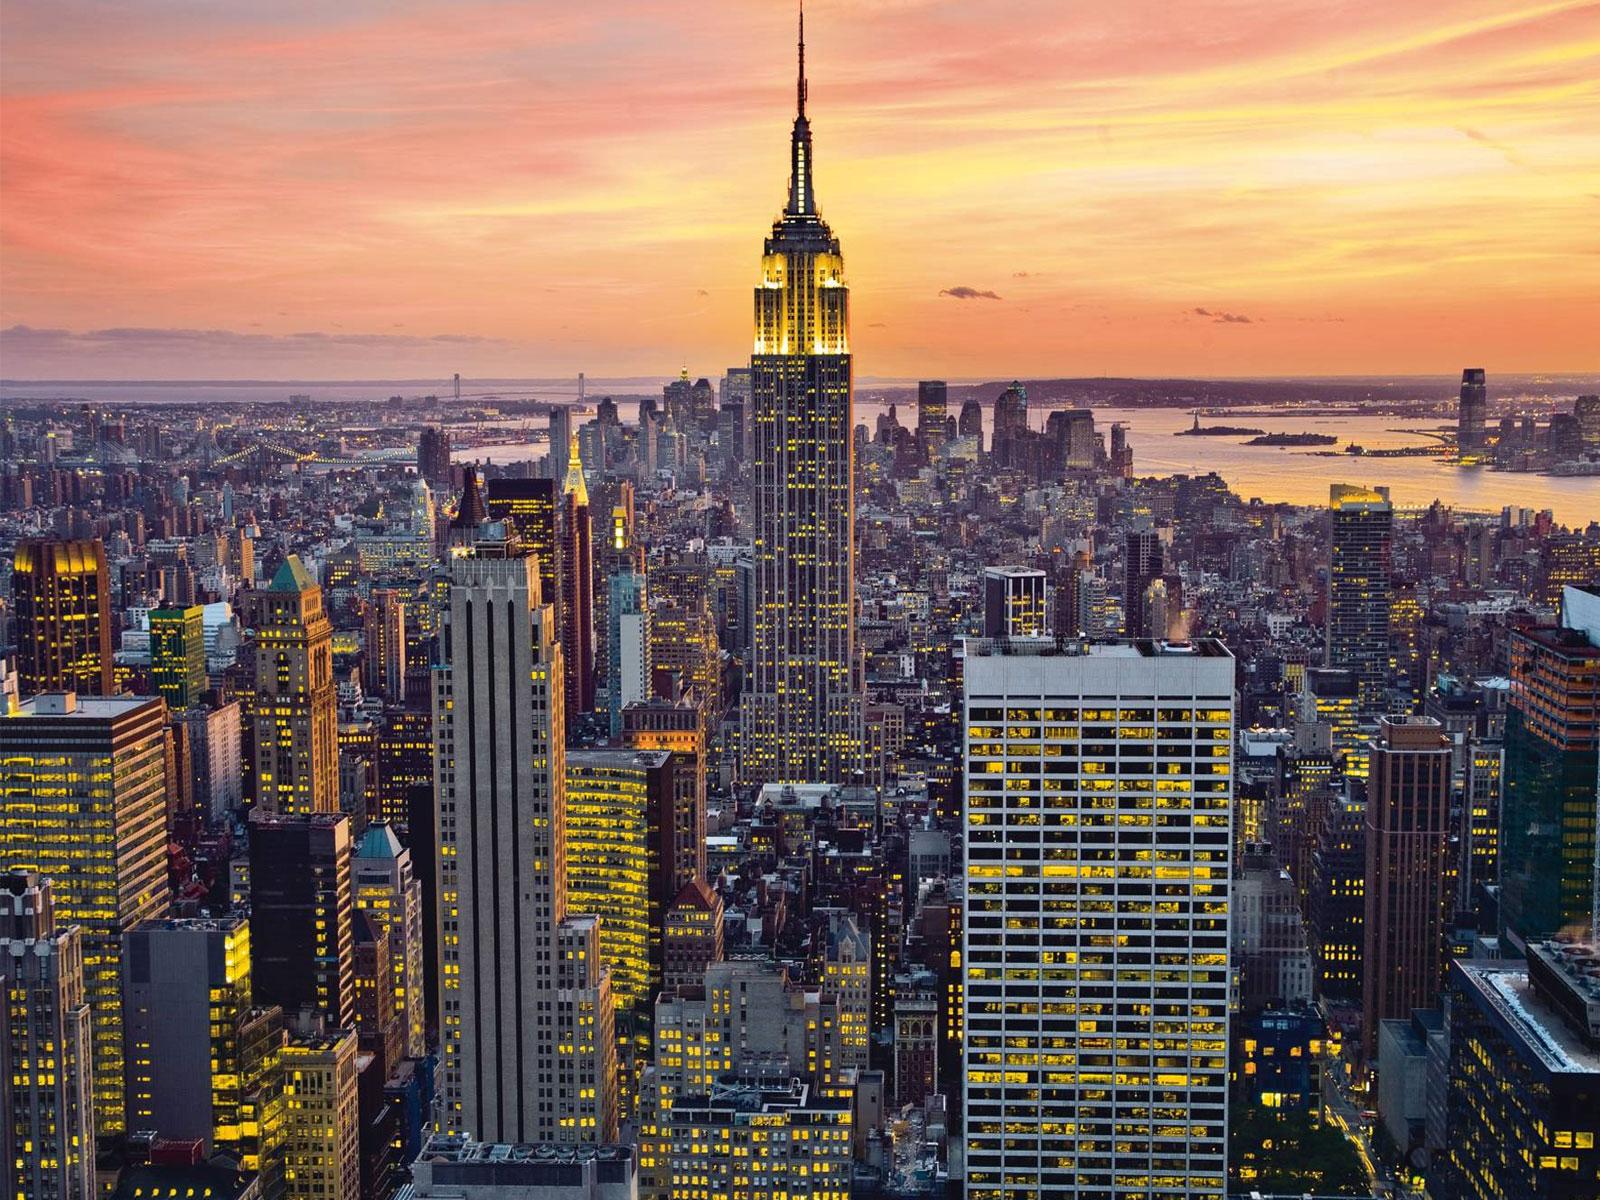 New York City New York Wallpaper Hd 1080p 1600x1200 Wallpapertip